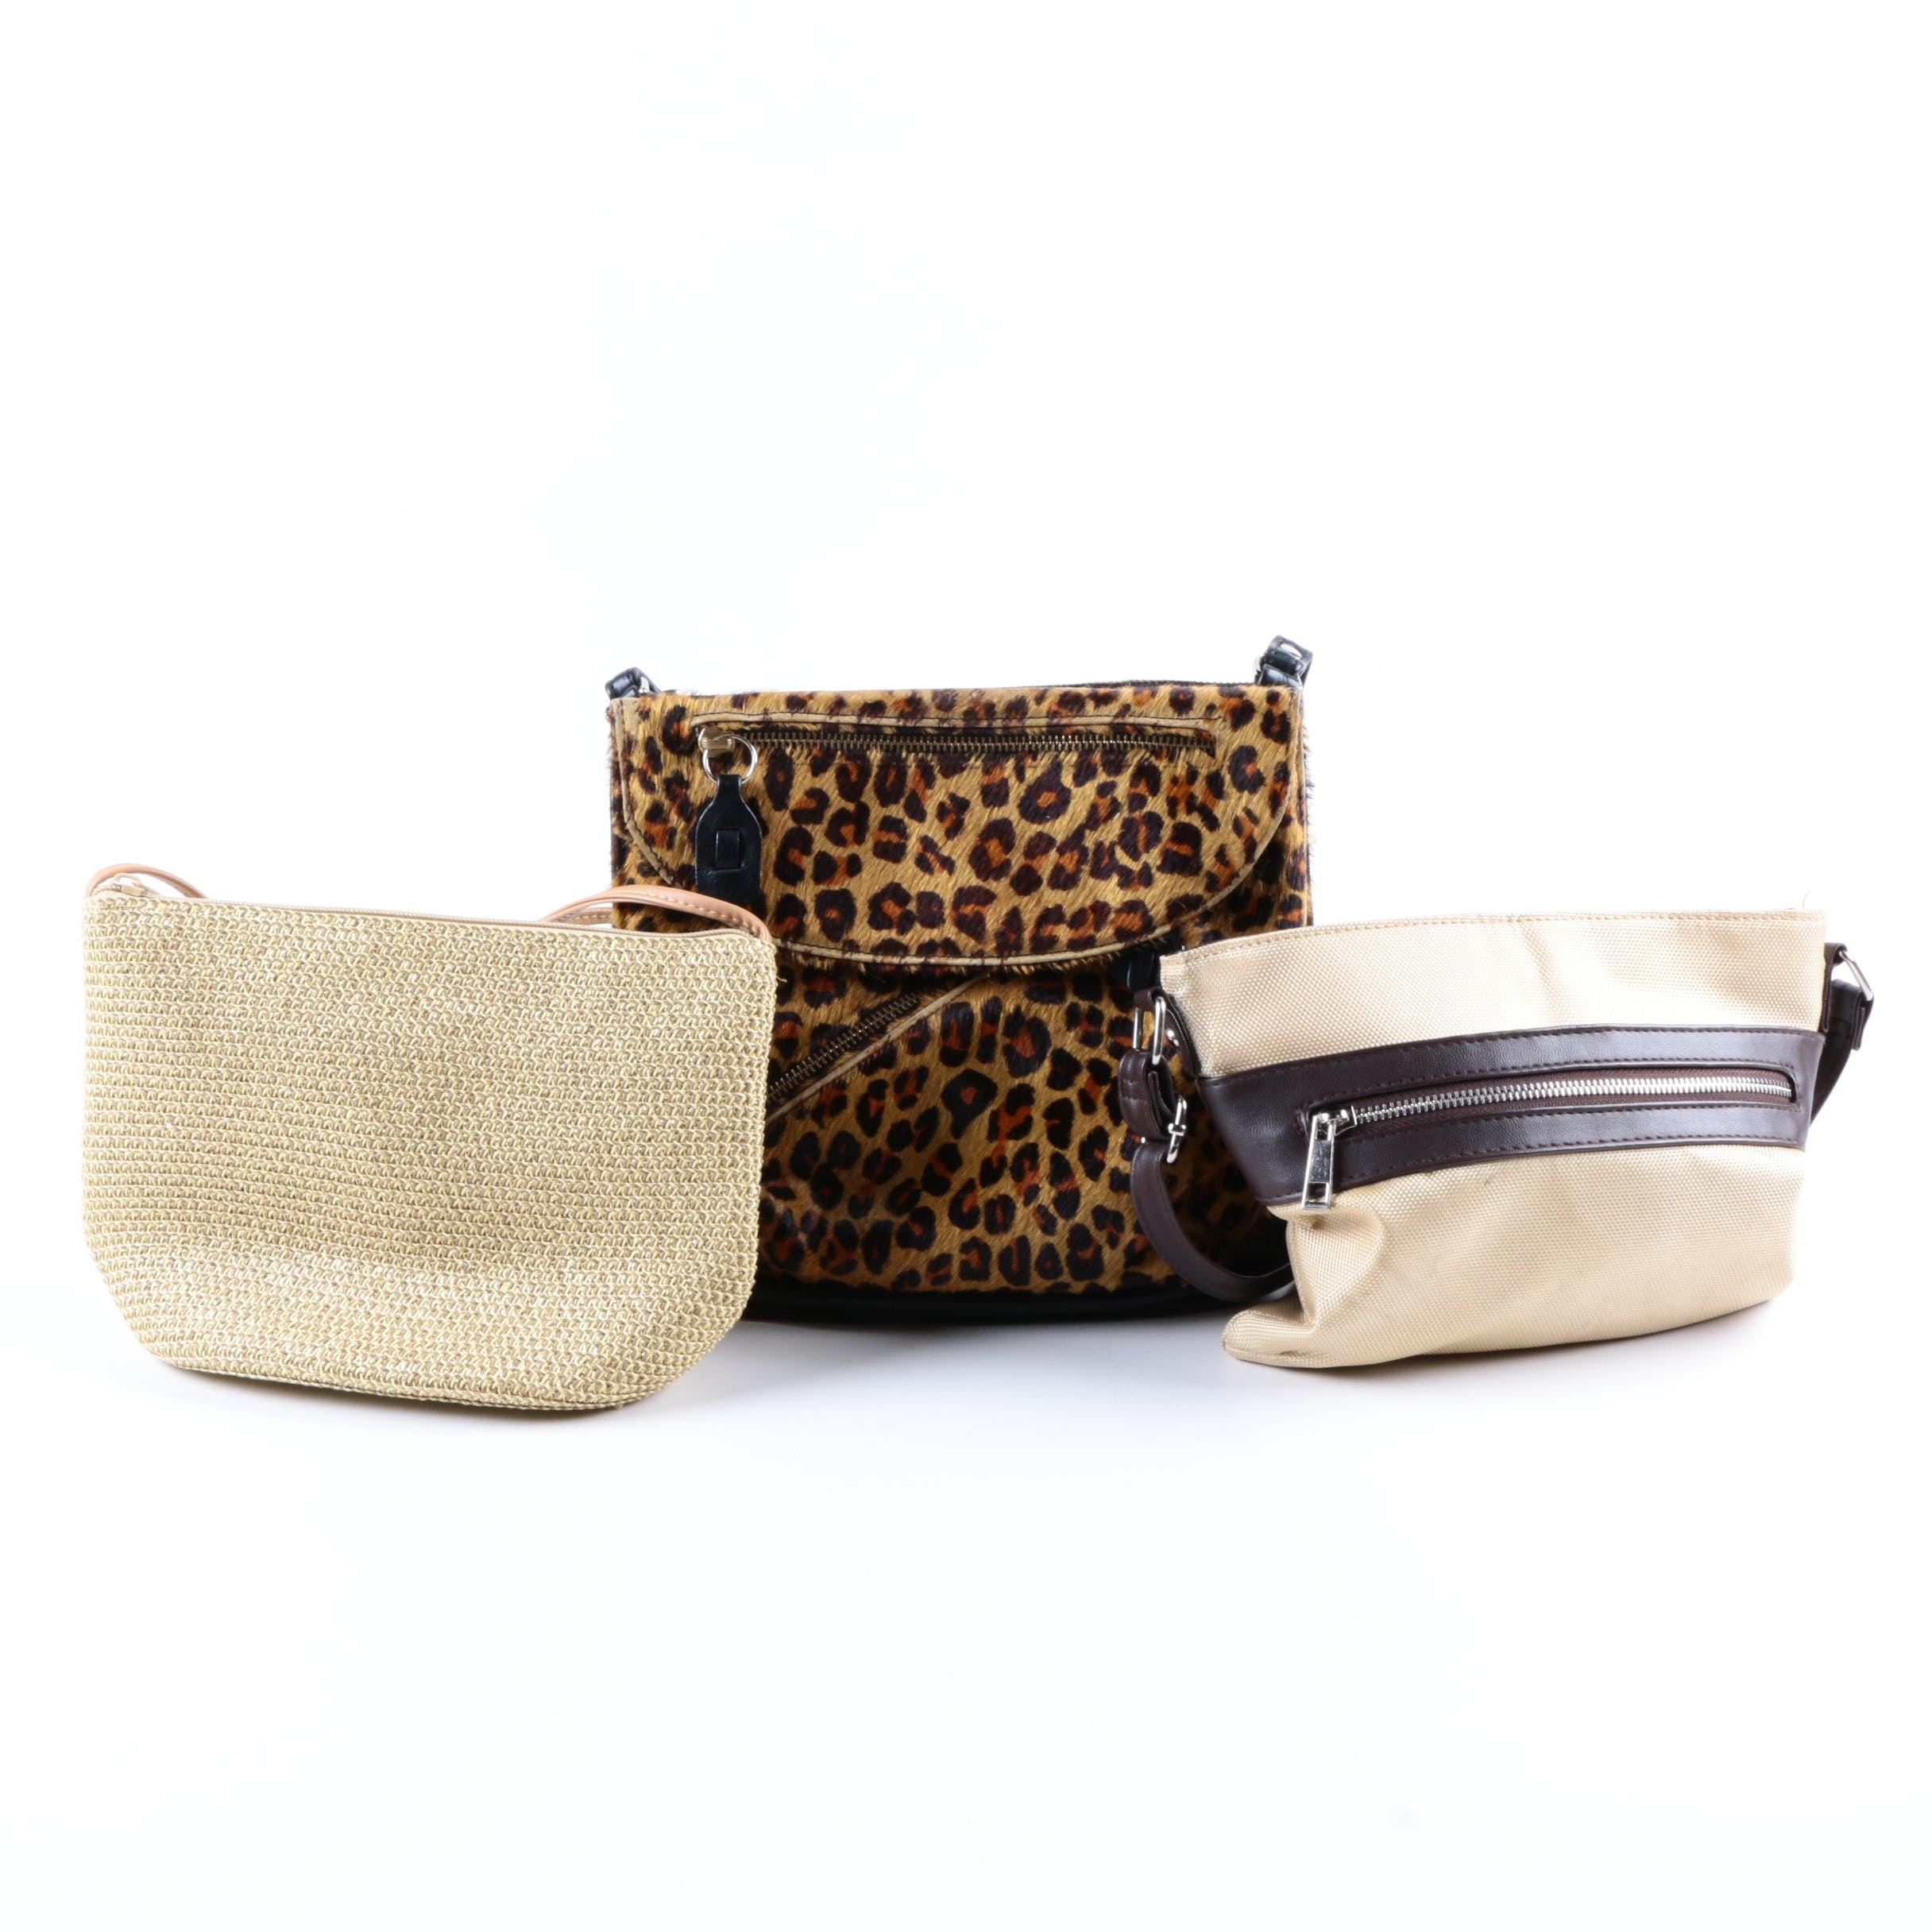 Beige and Brown Handbags